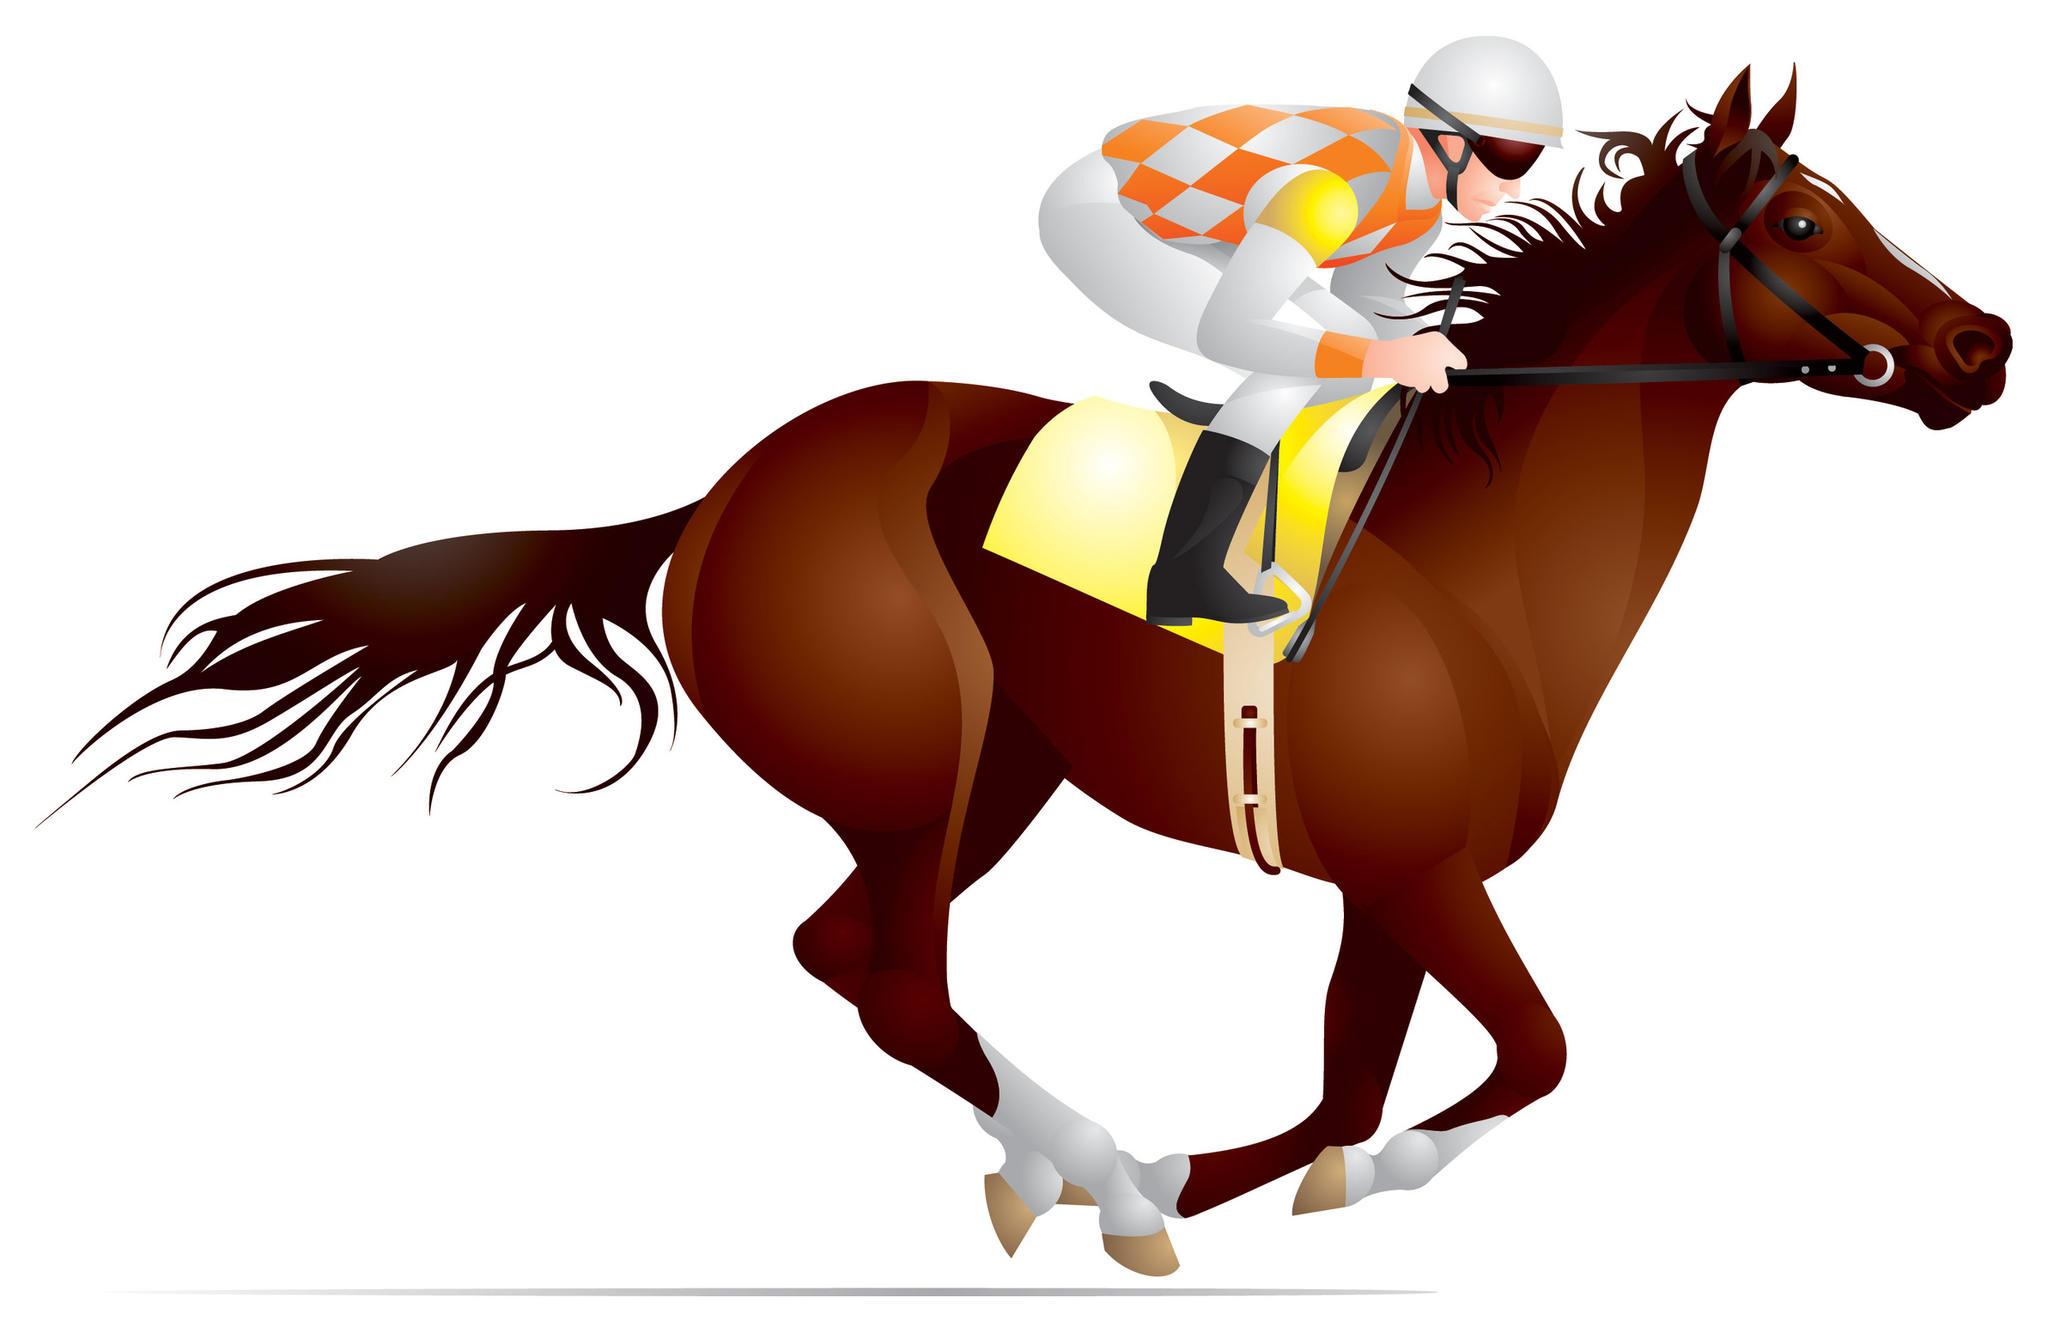 Race Horse Racing Clip Art N39 free image.